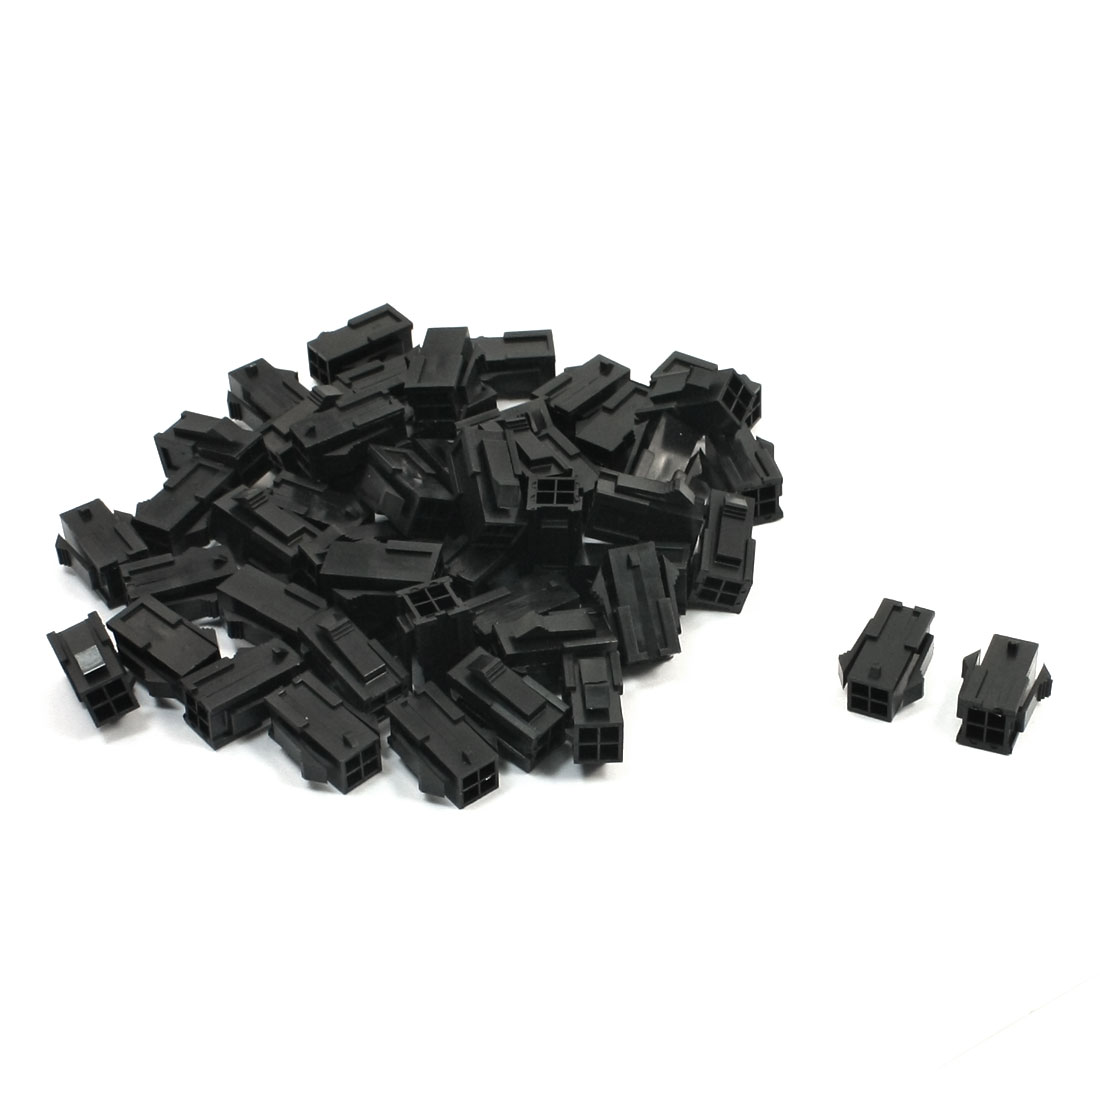 50Pcs 4 Pin Female 3mm Pitch Socket PCB Board Auto Car ATX Connector